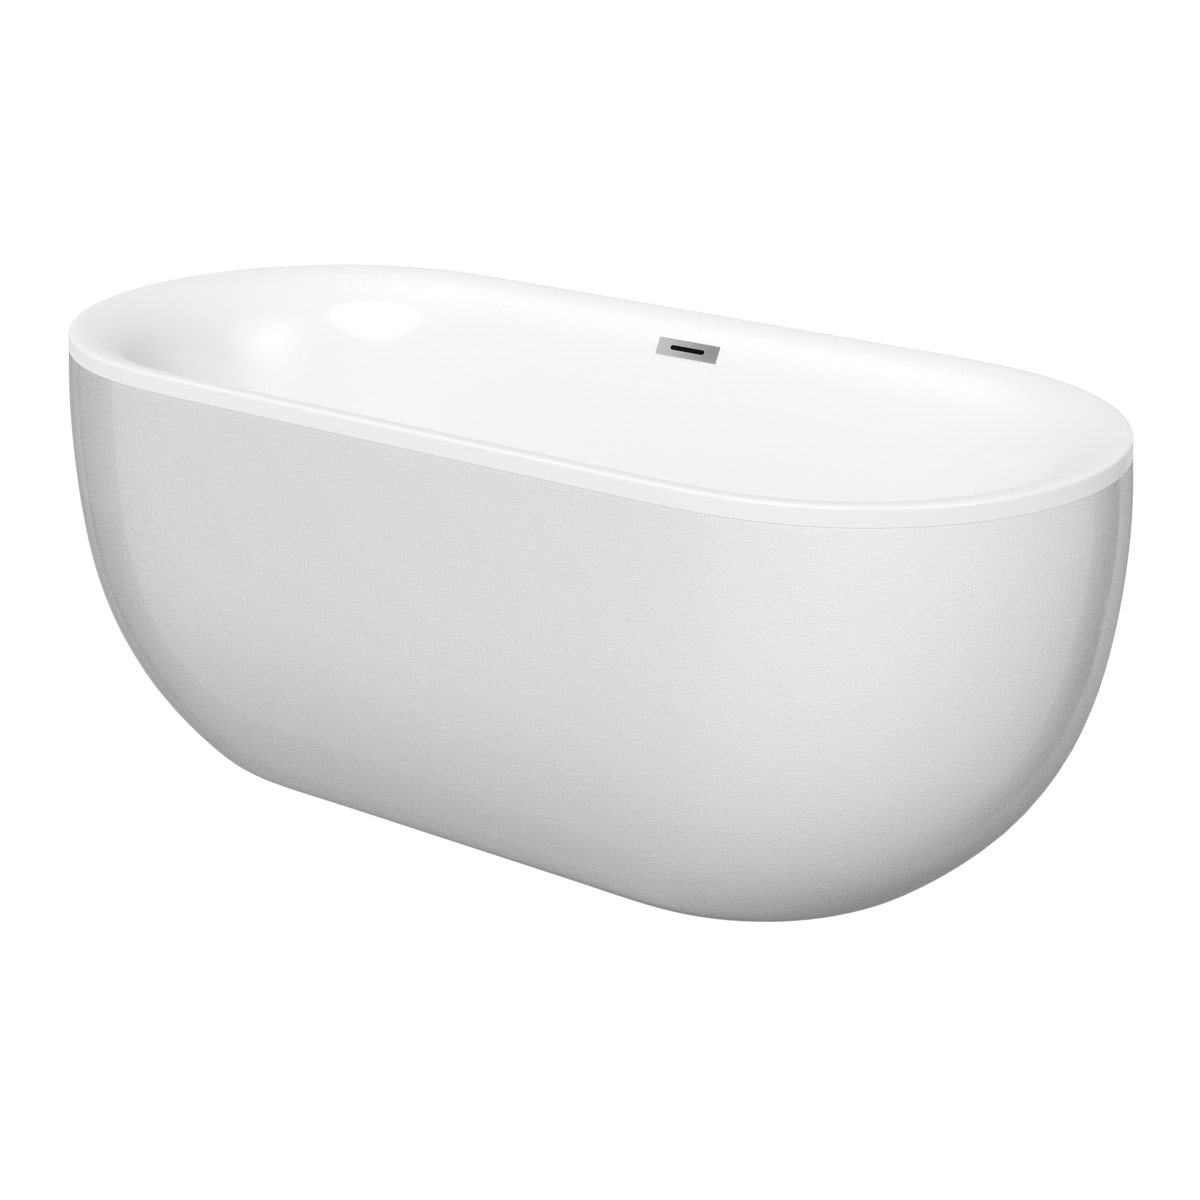 Mode ellis pearl coloured freestanding bath offer pack for Coloured free standing bath